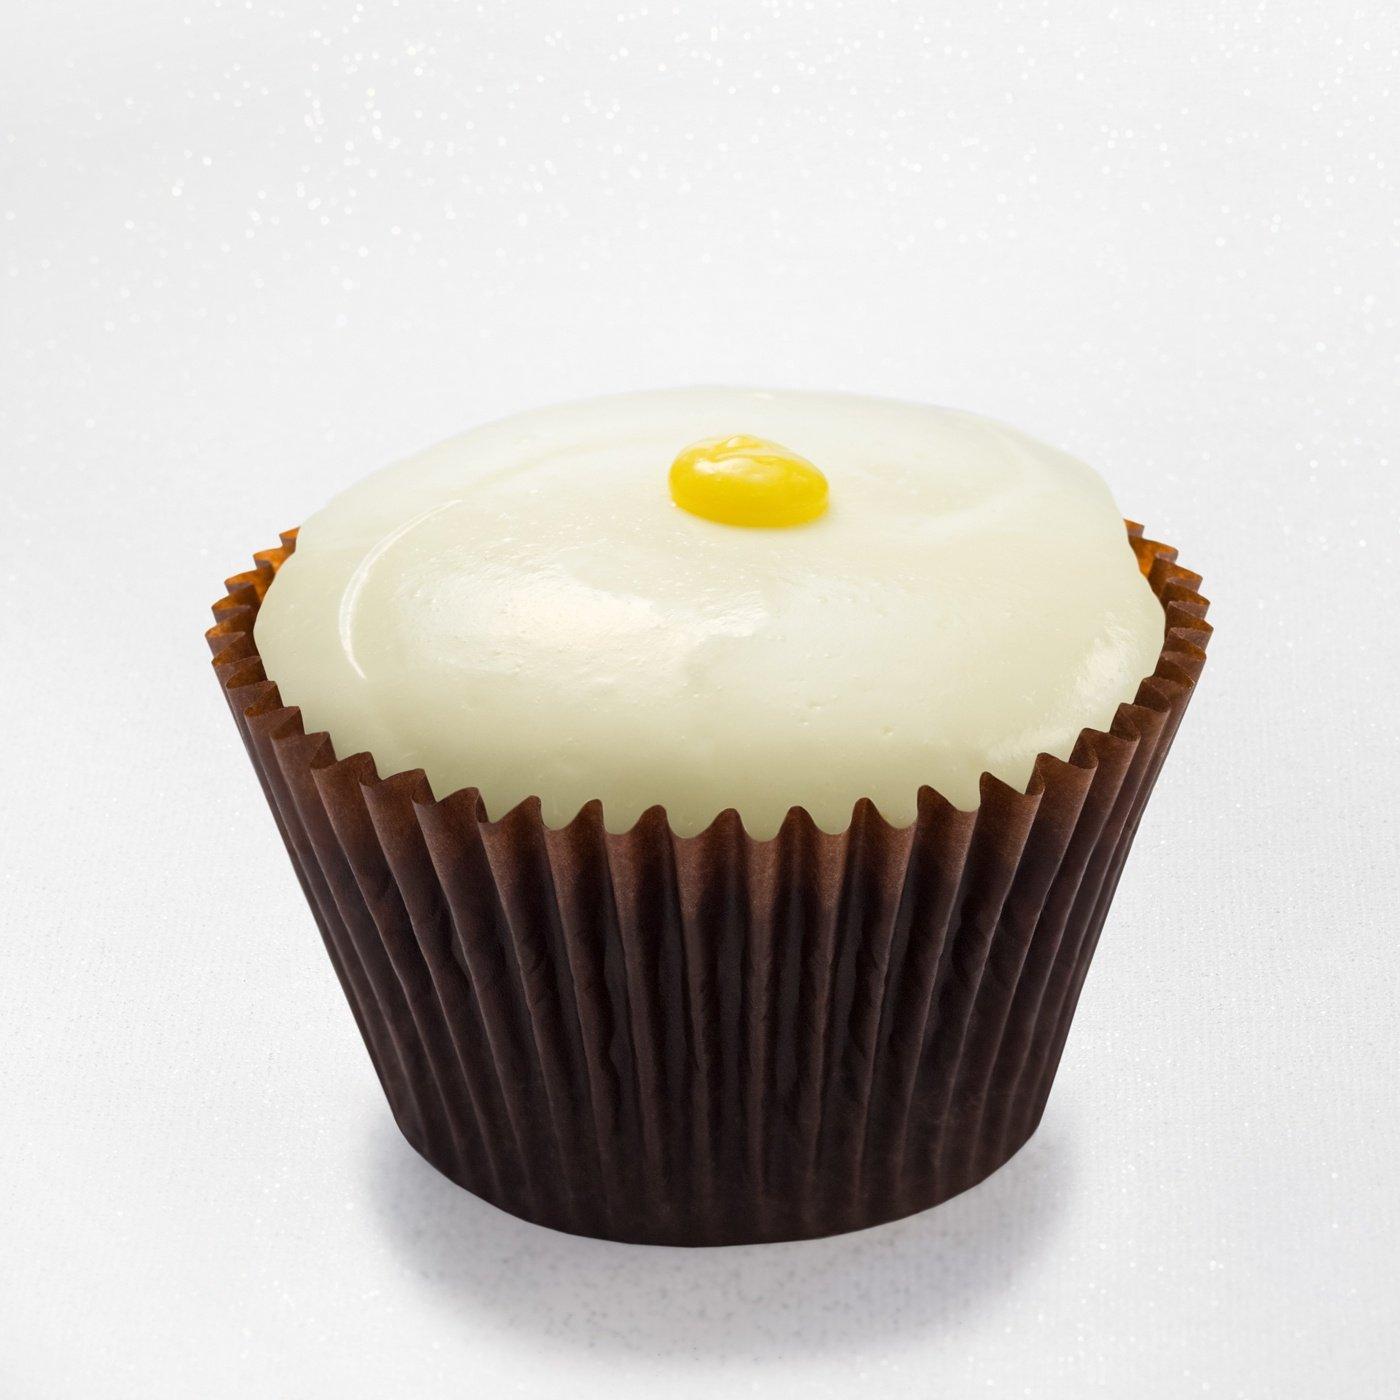 Lemon cupcake with lemon cream